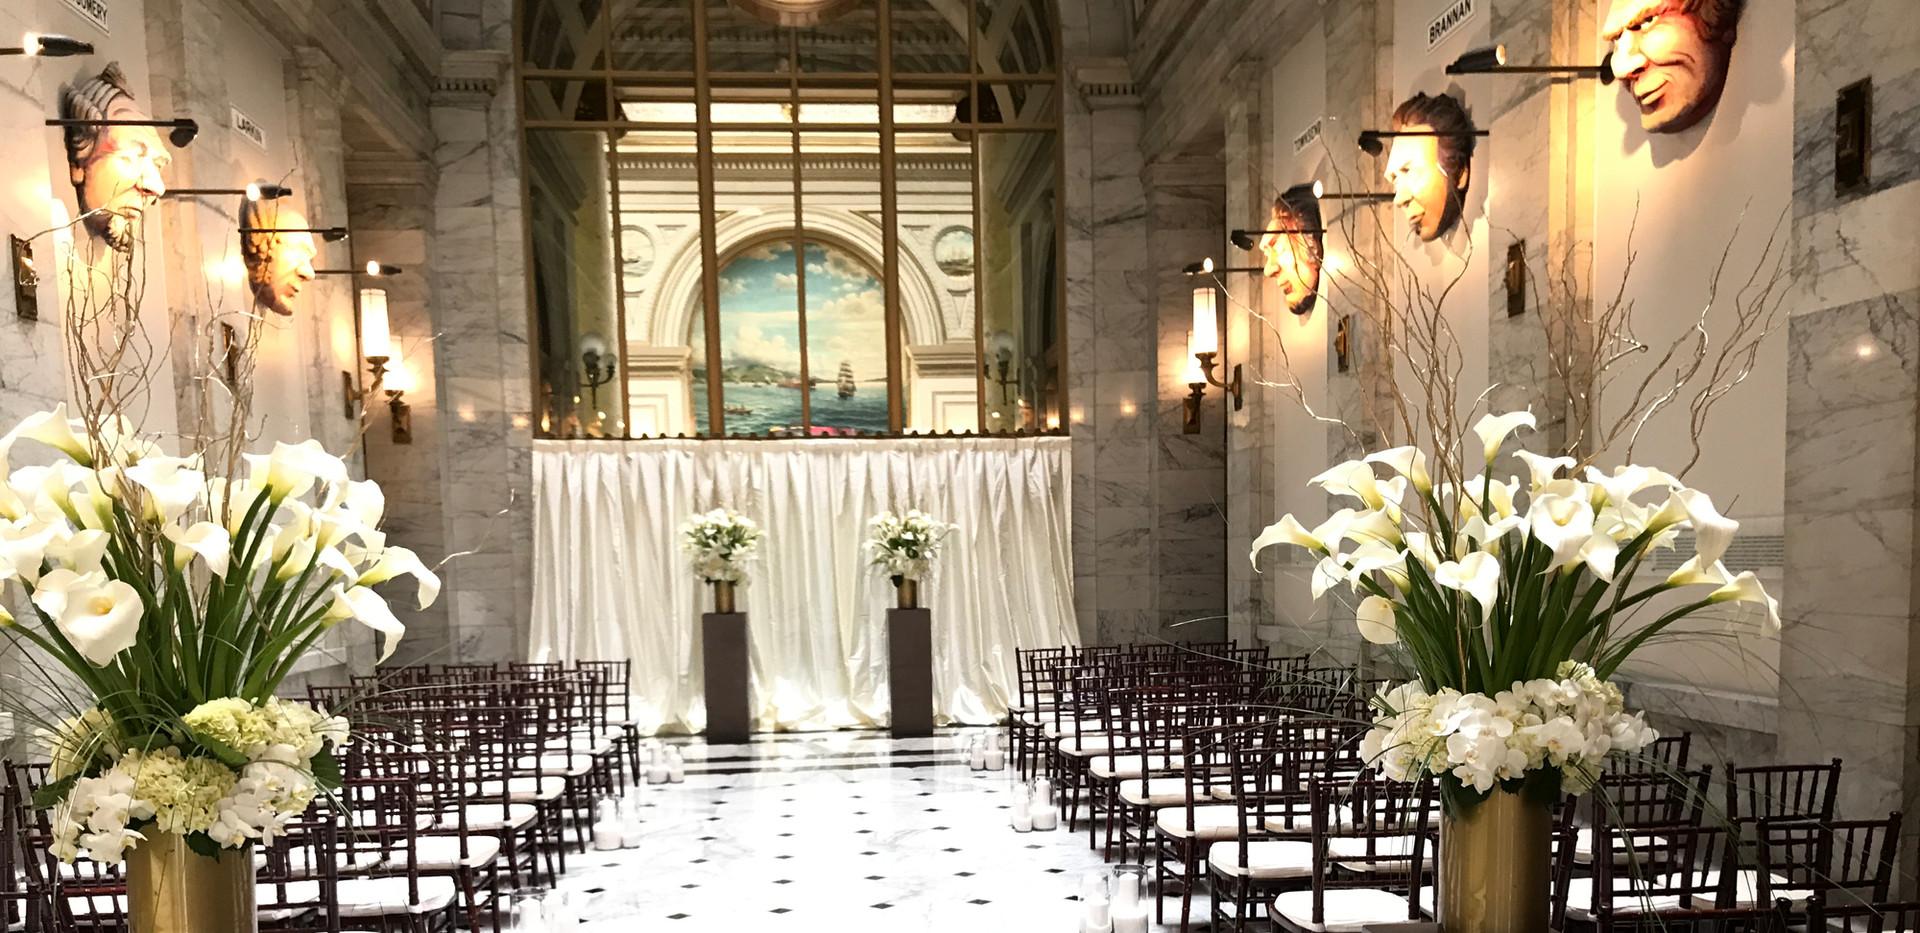 M.L. Wedding Julia Morgan building S.F. jpeg